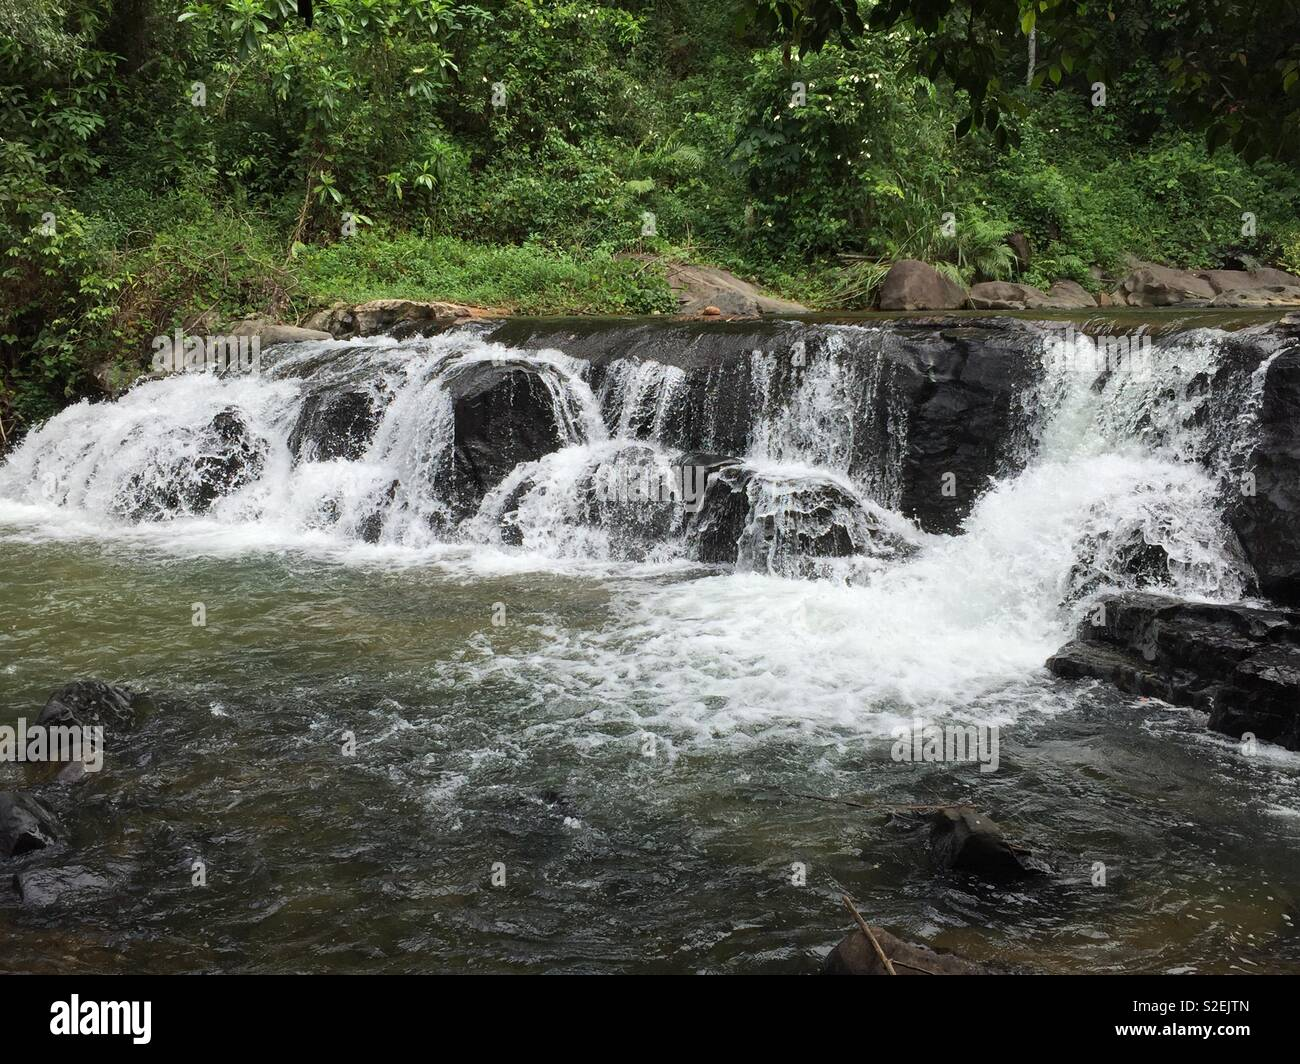 Kumari ella upper srilanka - Stock Image